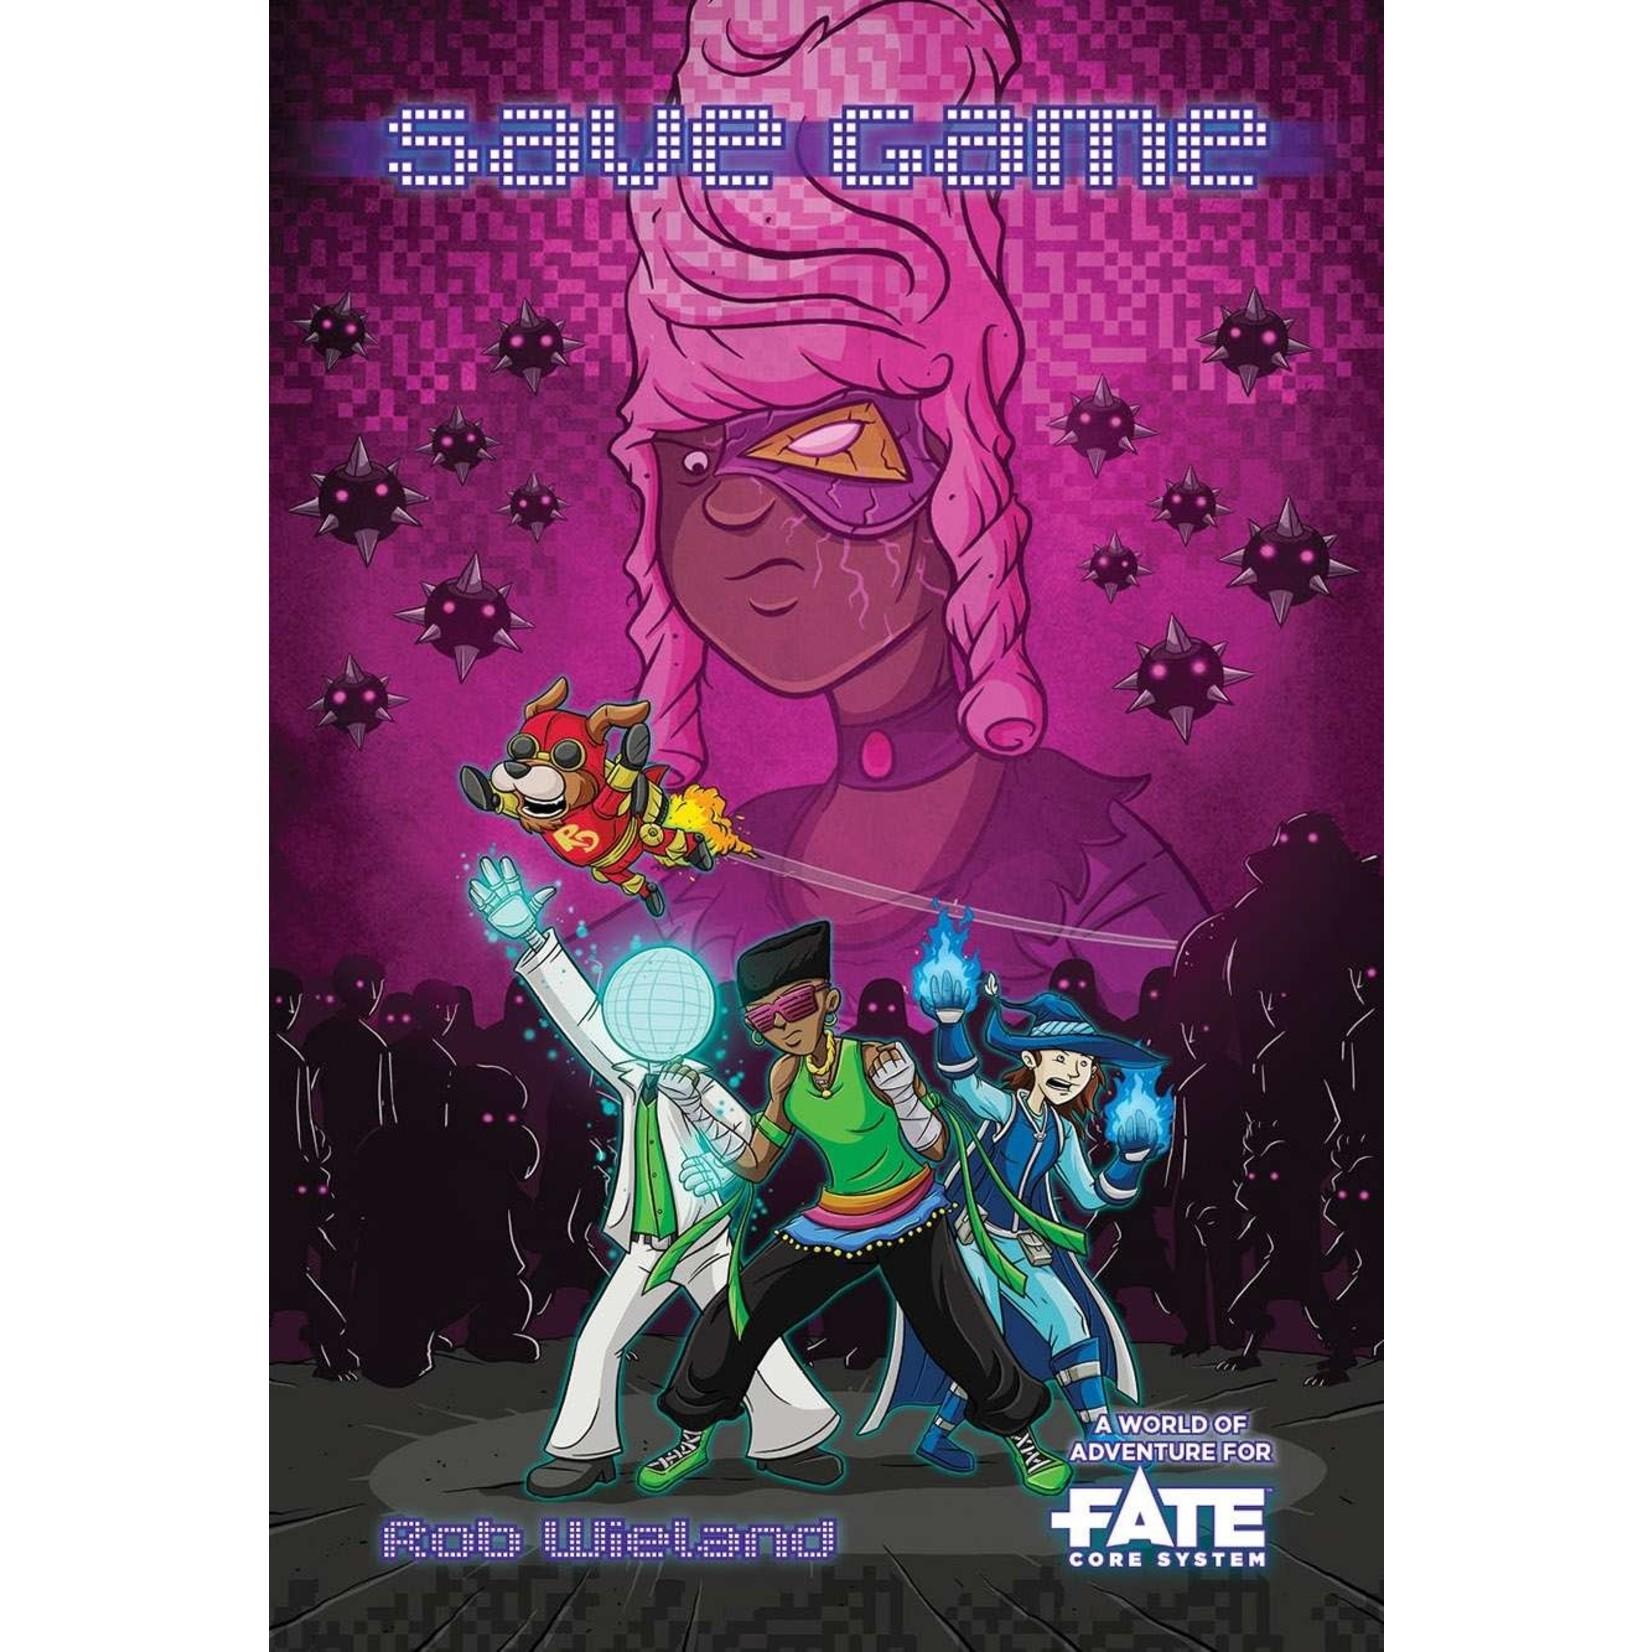 FATE RPG: Save Game